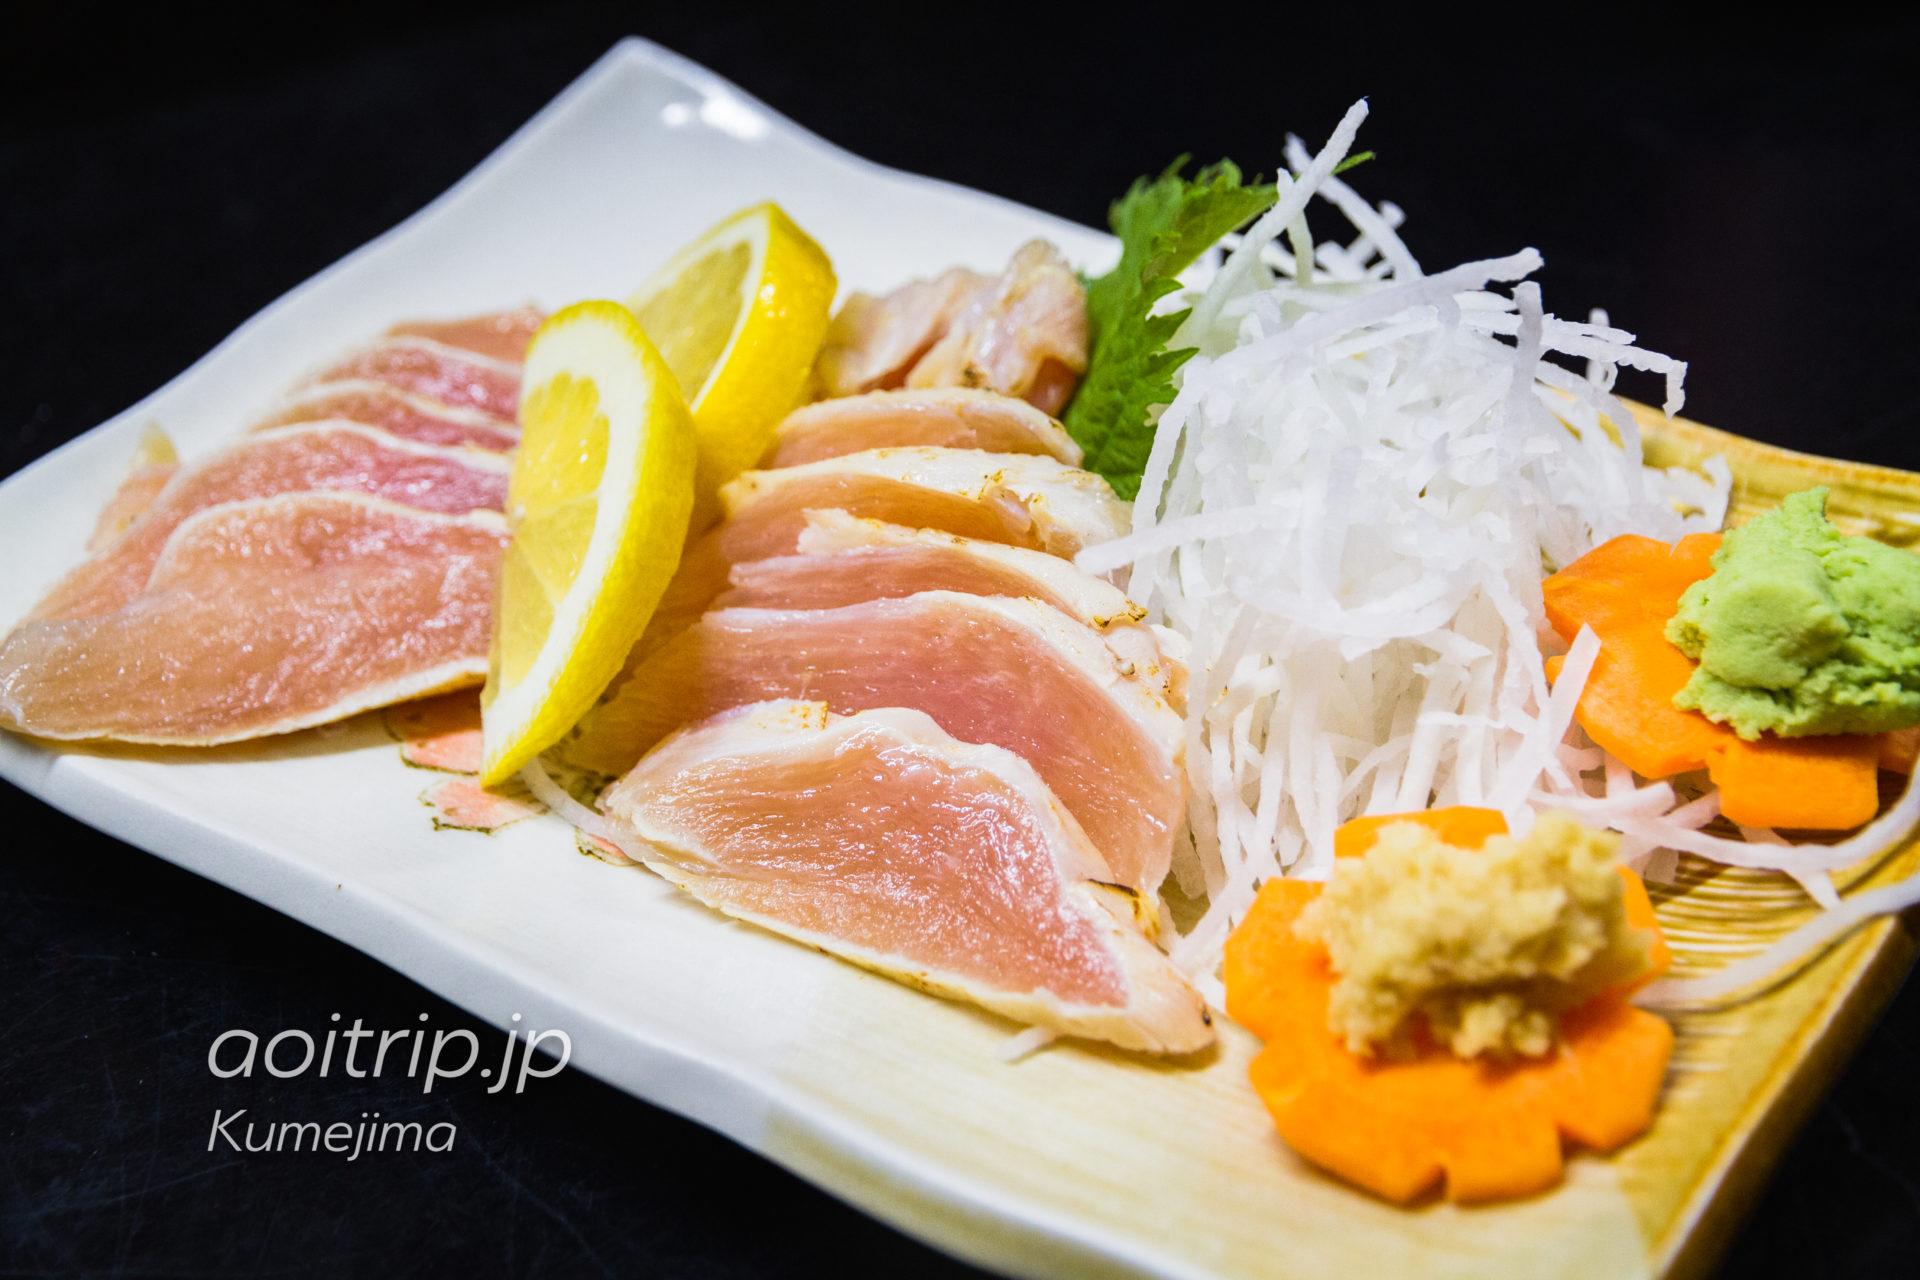 久米島の居酒屋「波路」 久米島鶏刺し